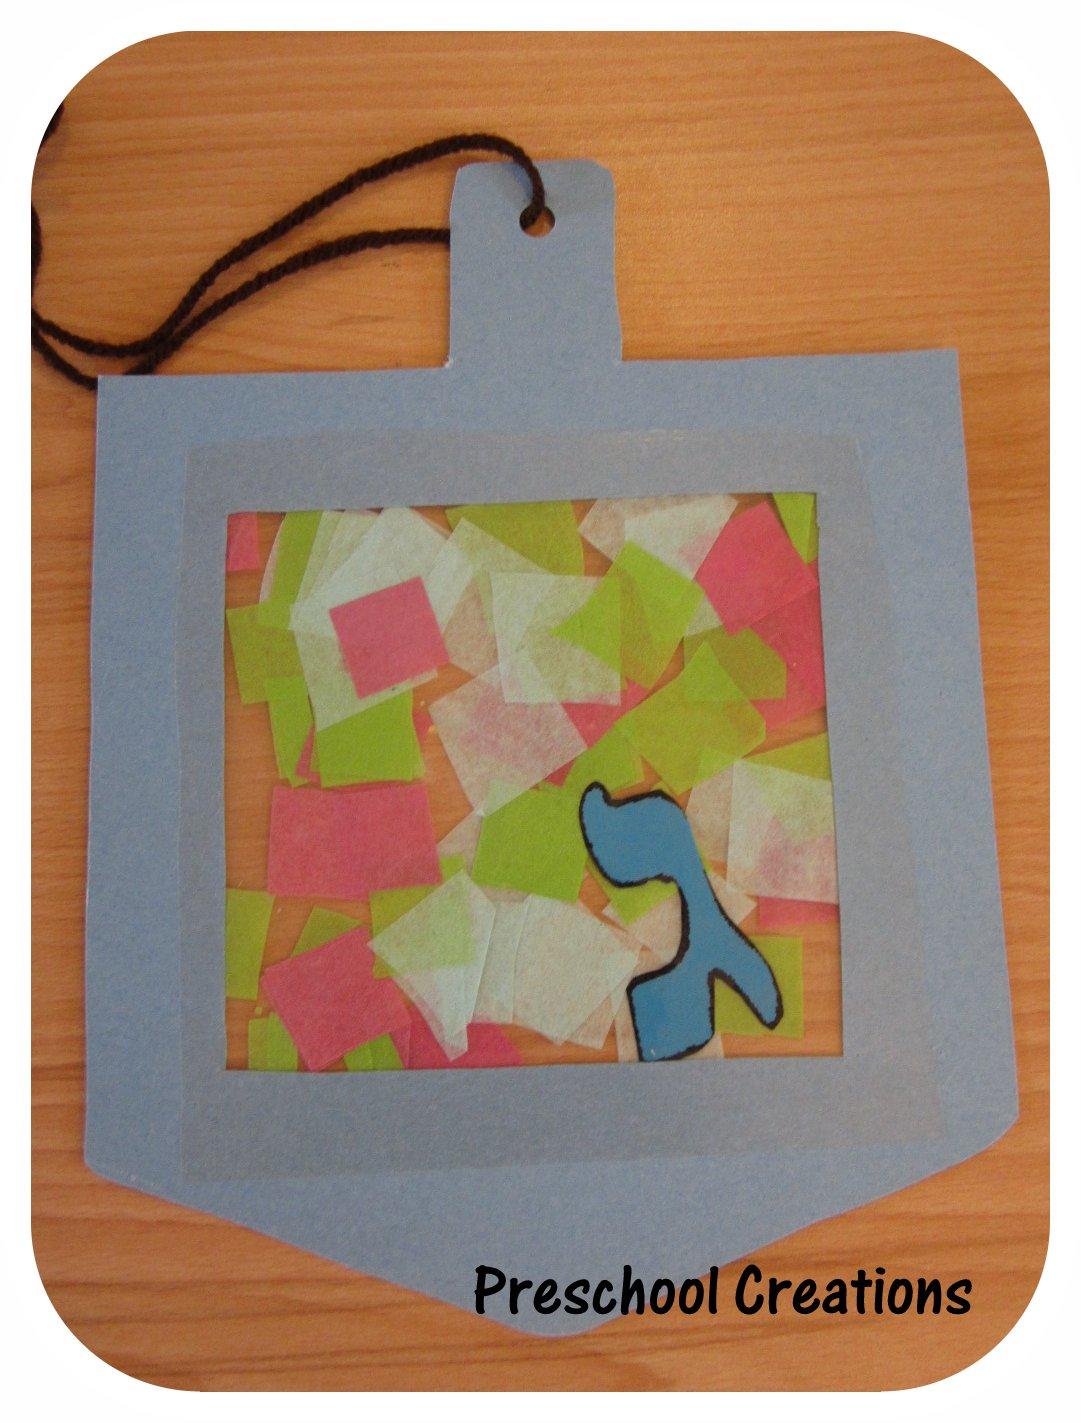 Preschool Creations Chanukah Dreidel